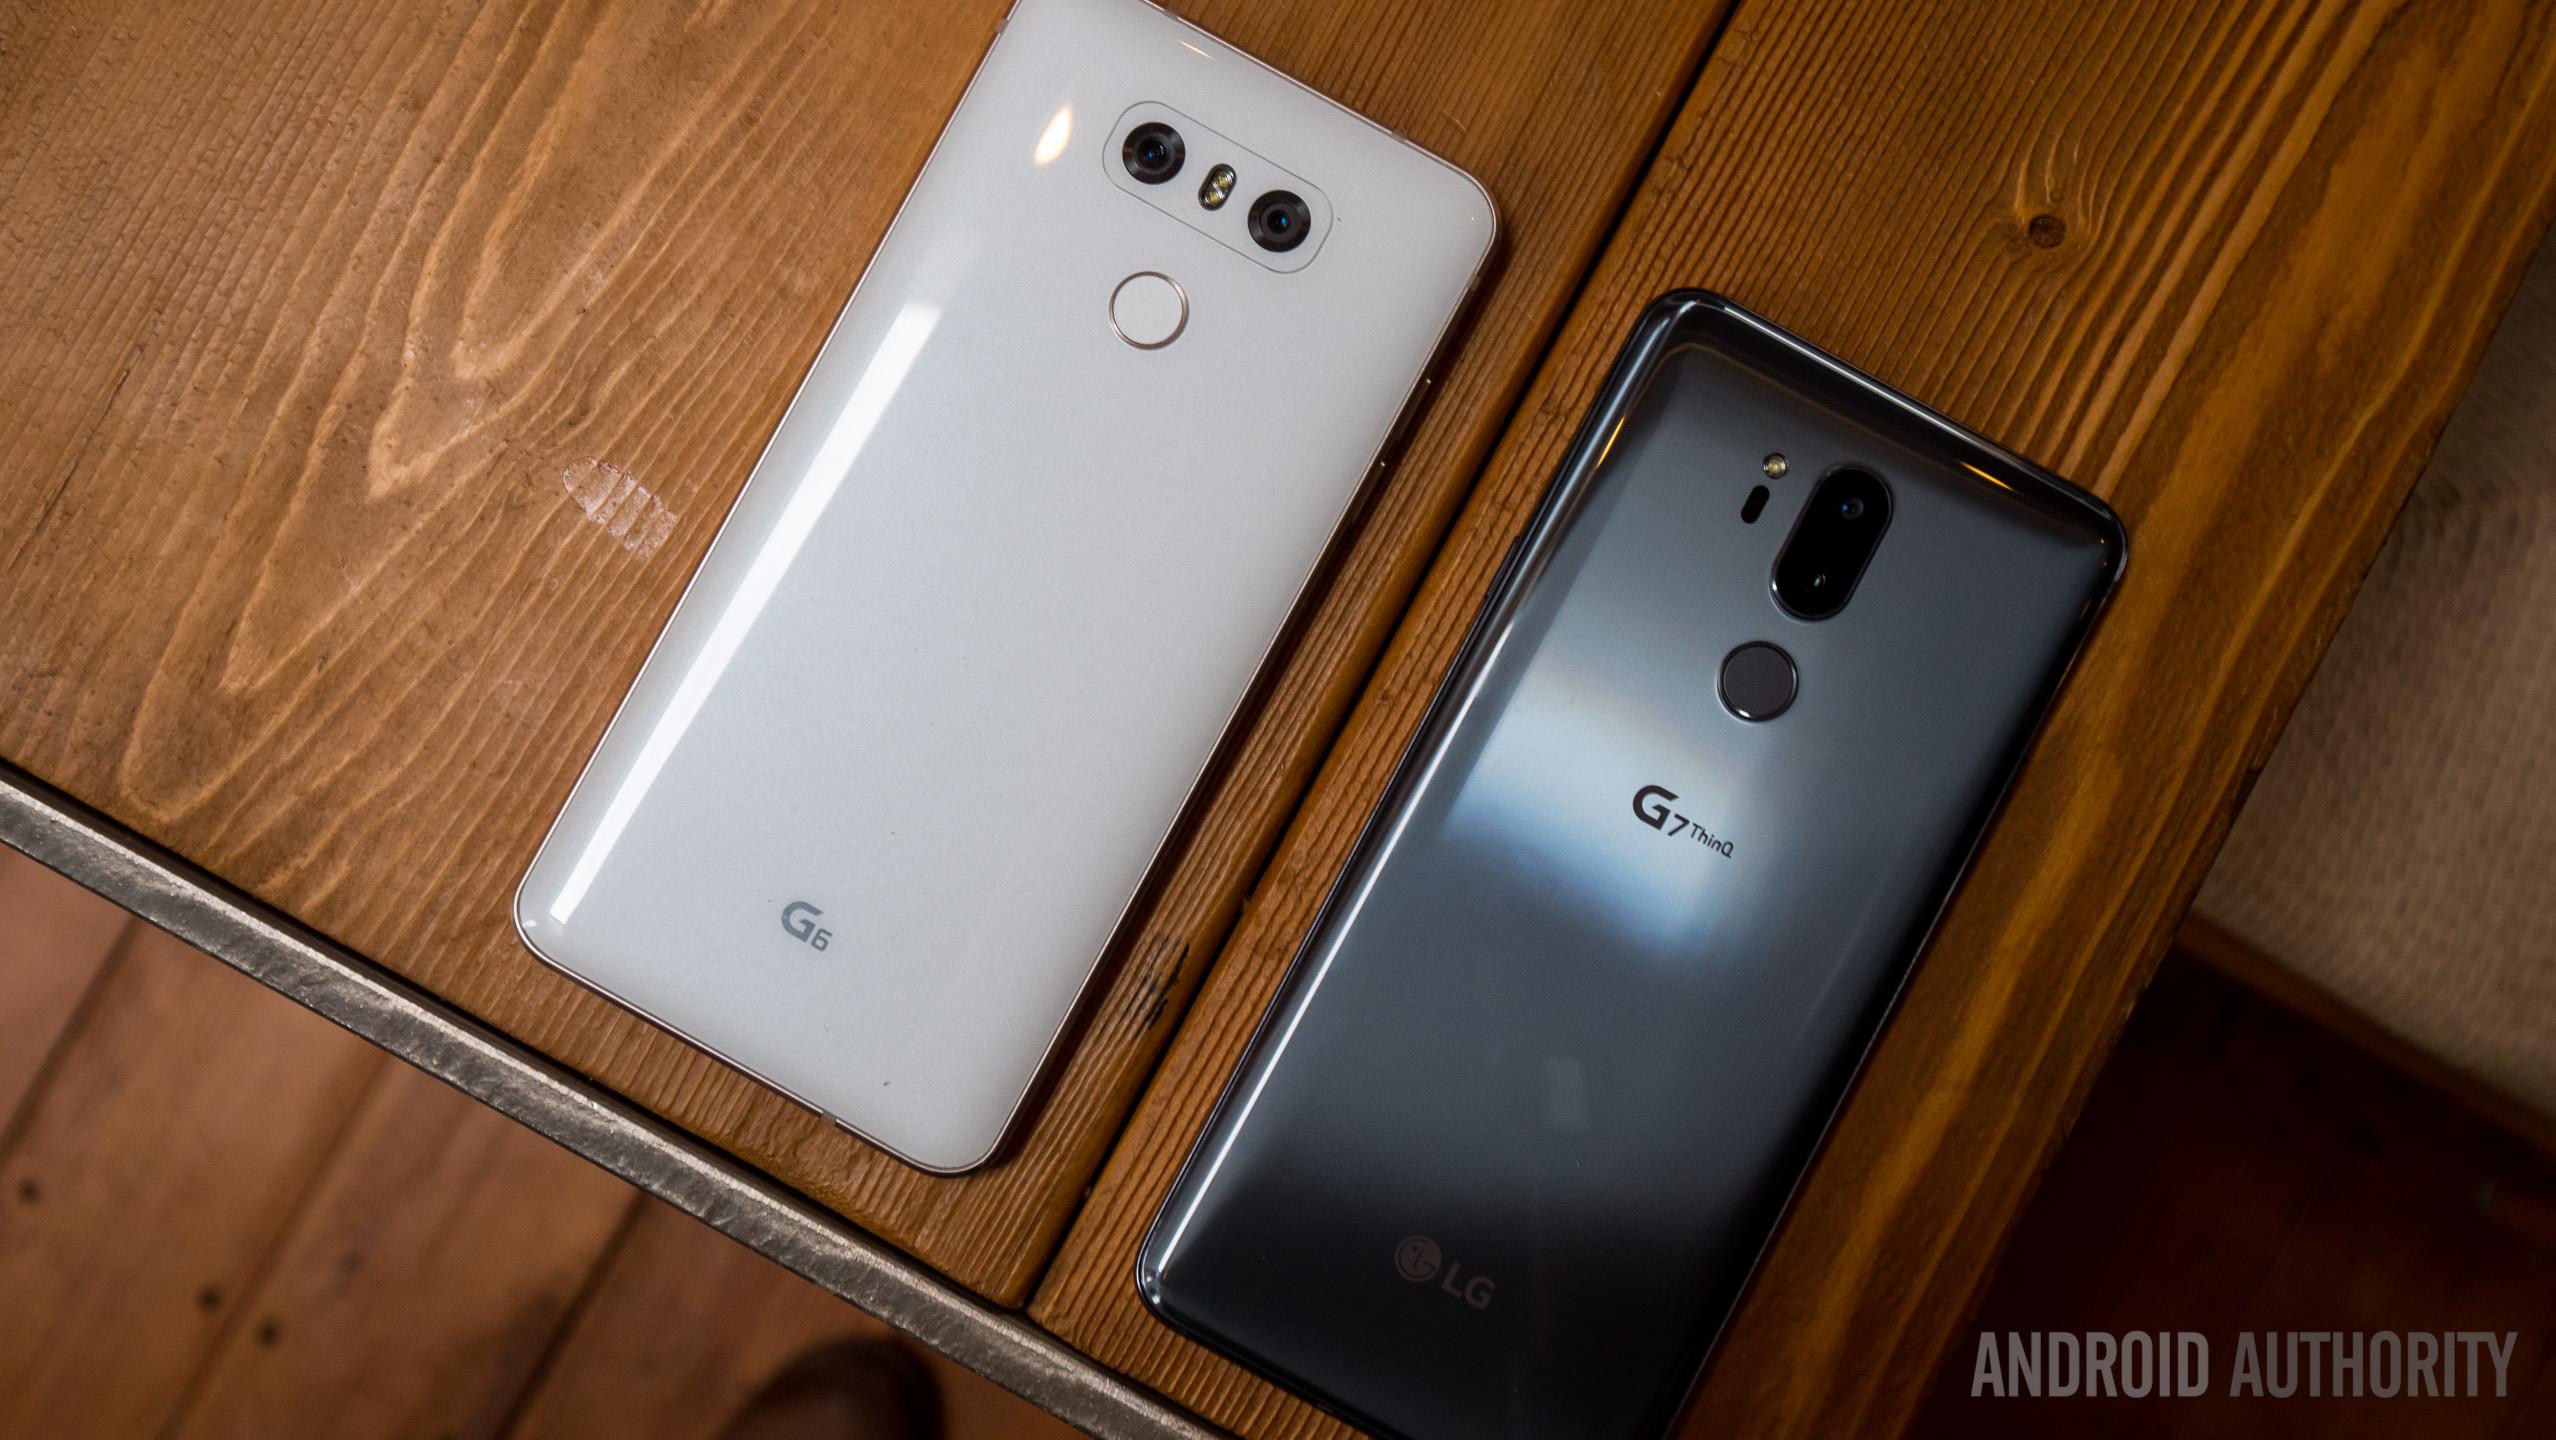 LG G7 vs LG G6 camera